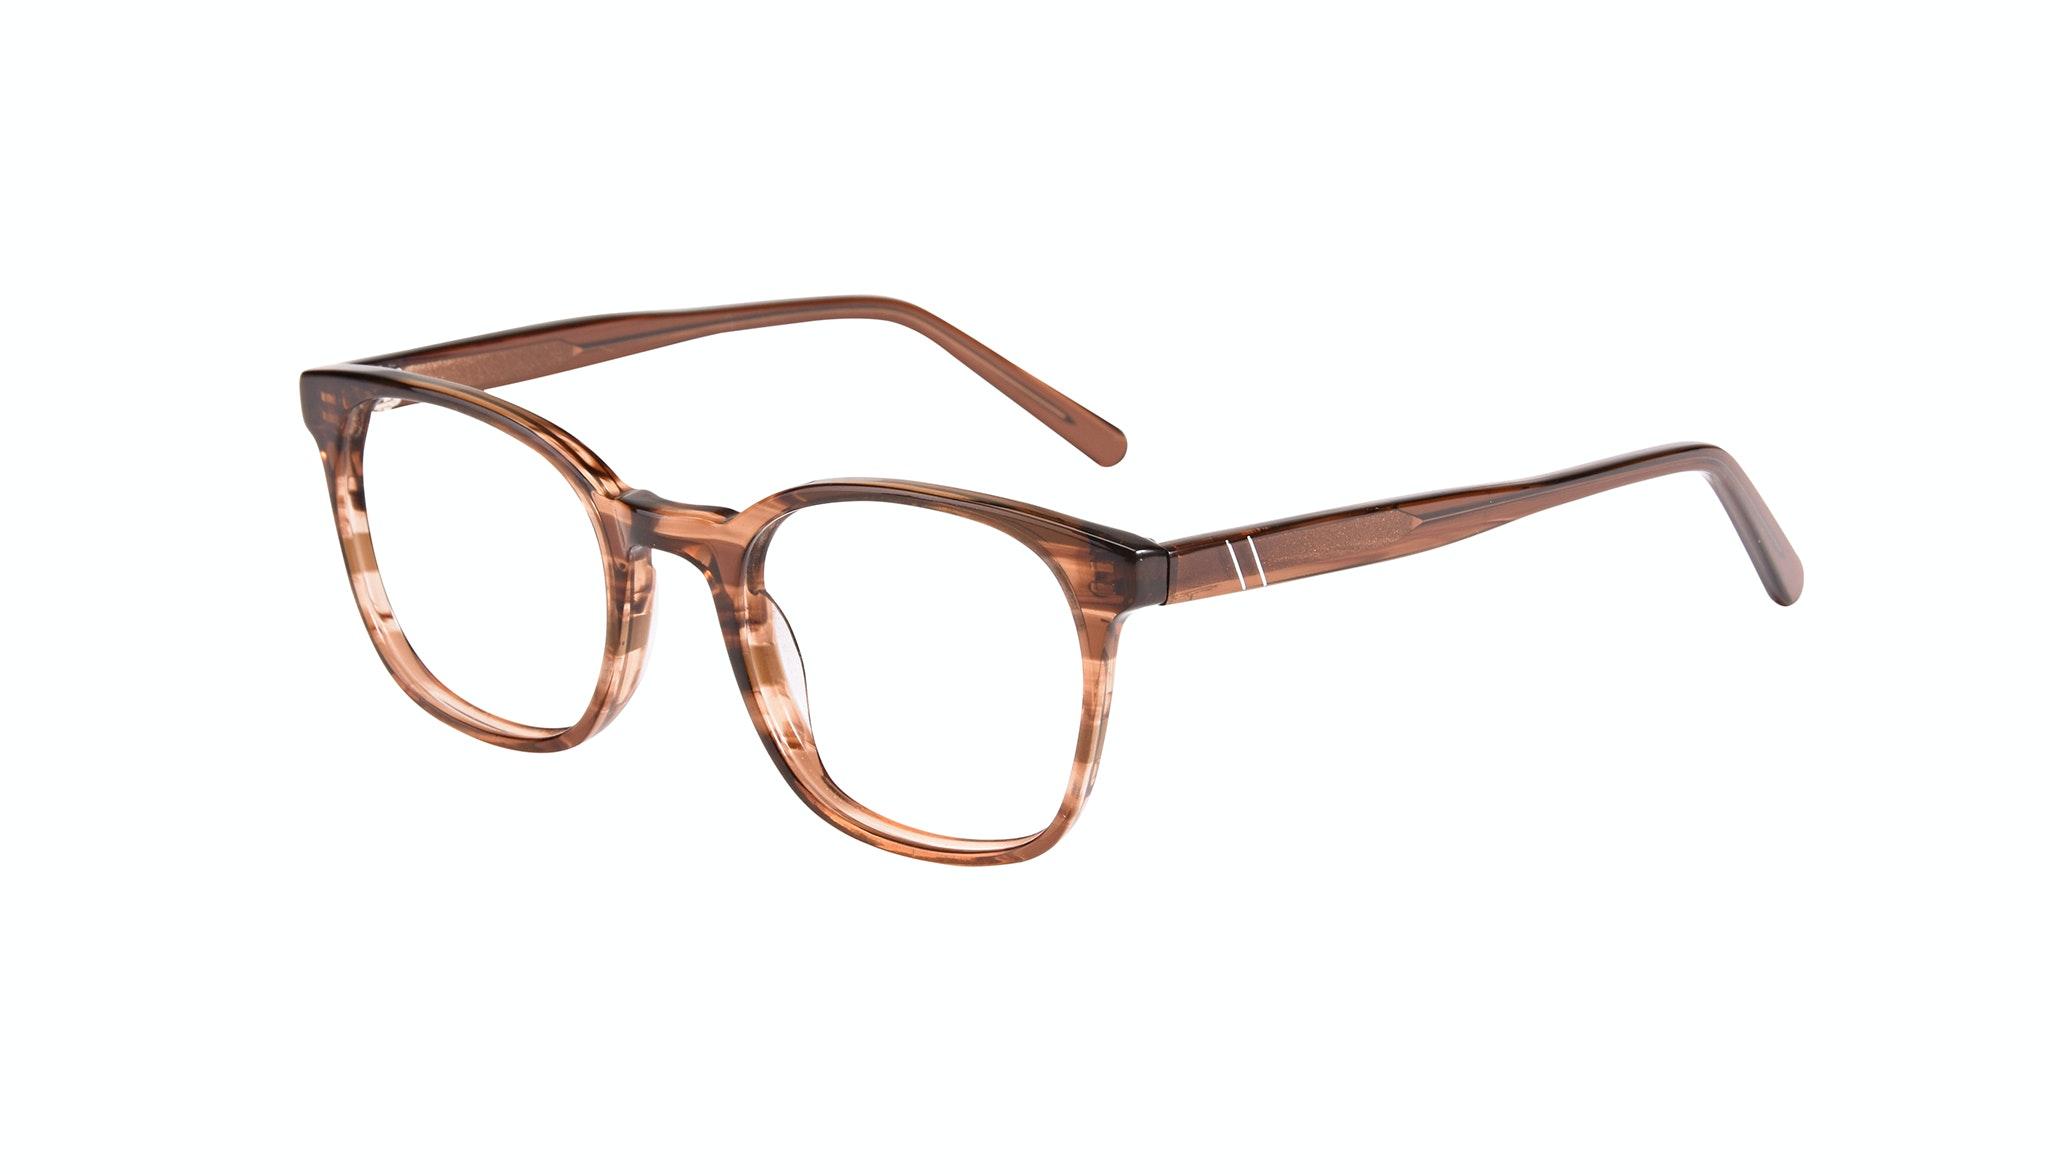 Affordable Fashion Glasses Rectangle Square Eyeglasses Men Peak Wood Tilt